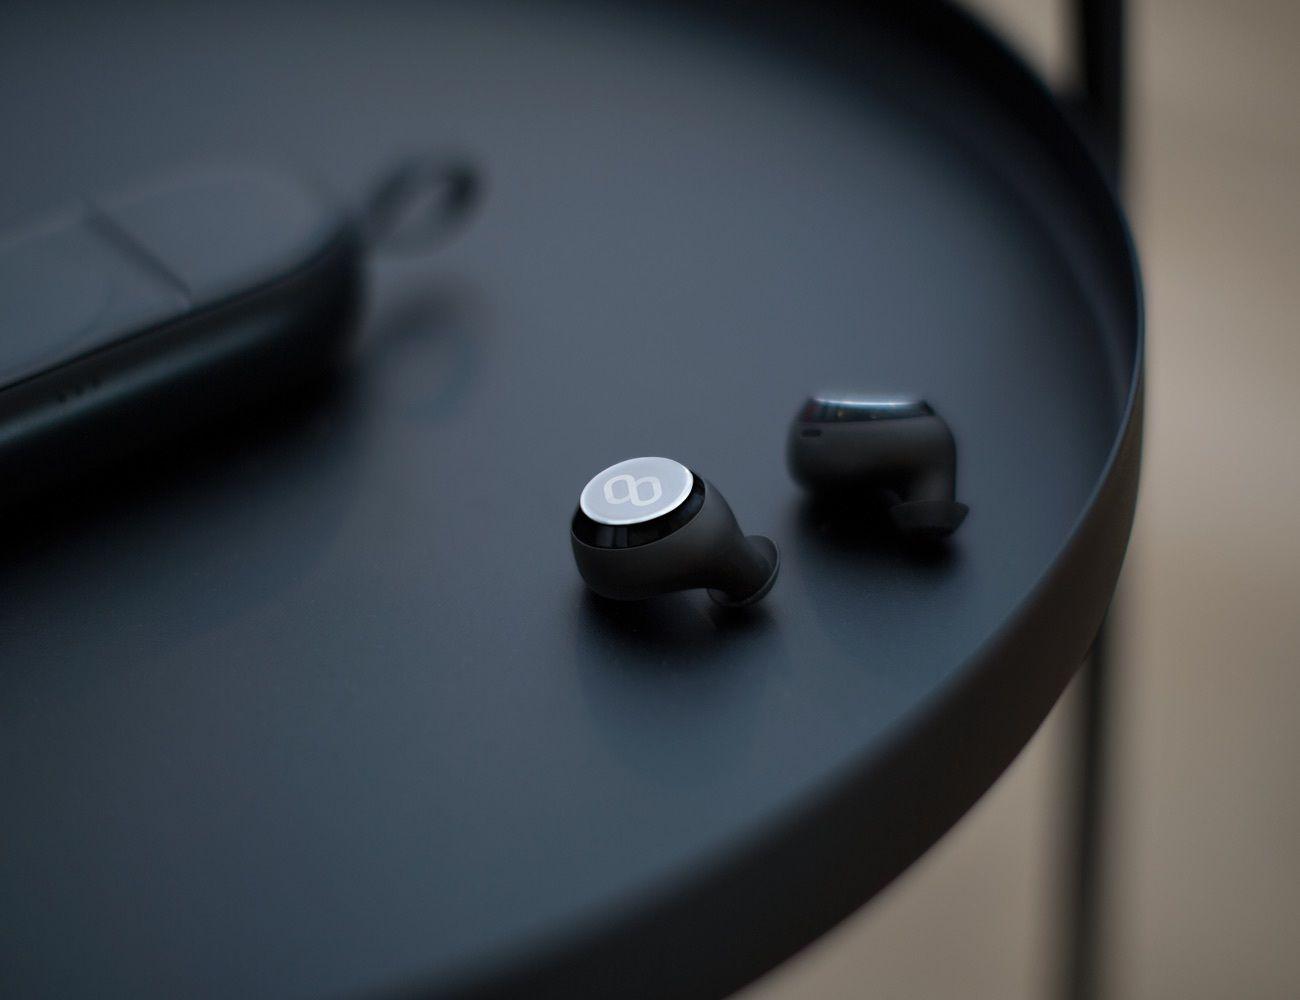 Mymanu CLIK-Truly Wireless Earbuds With Voice Translation